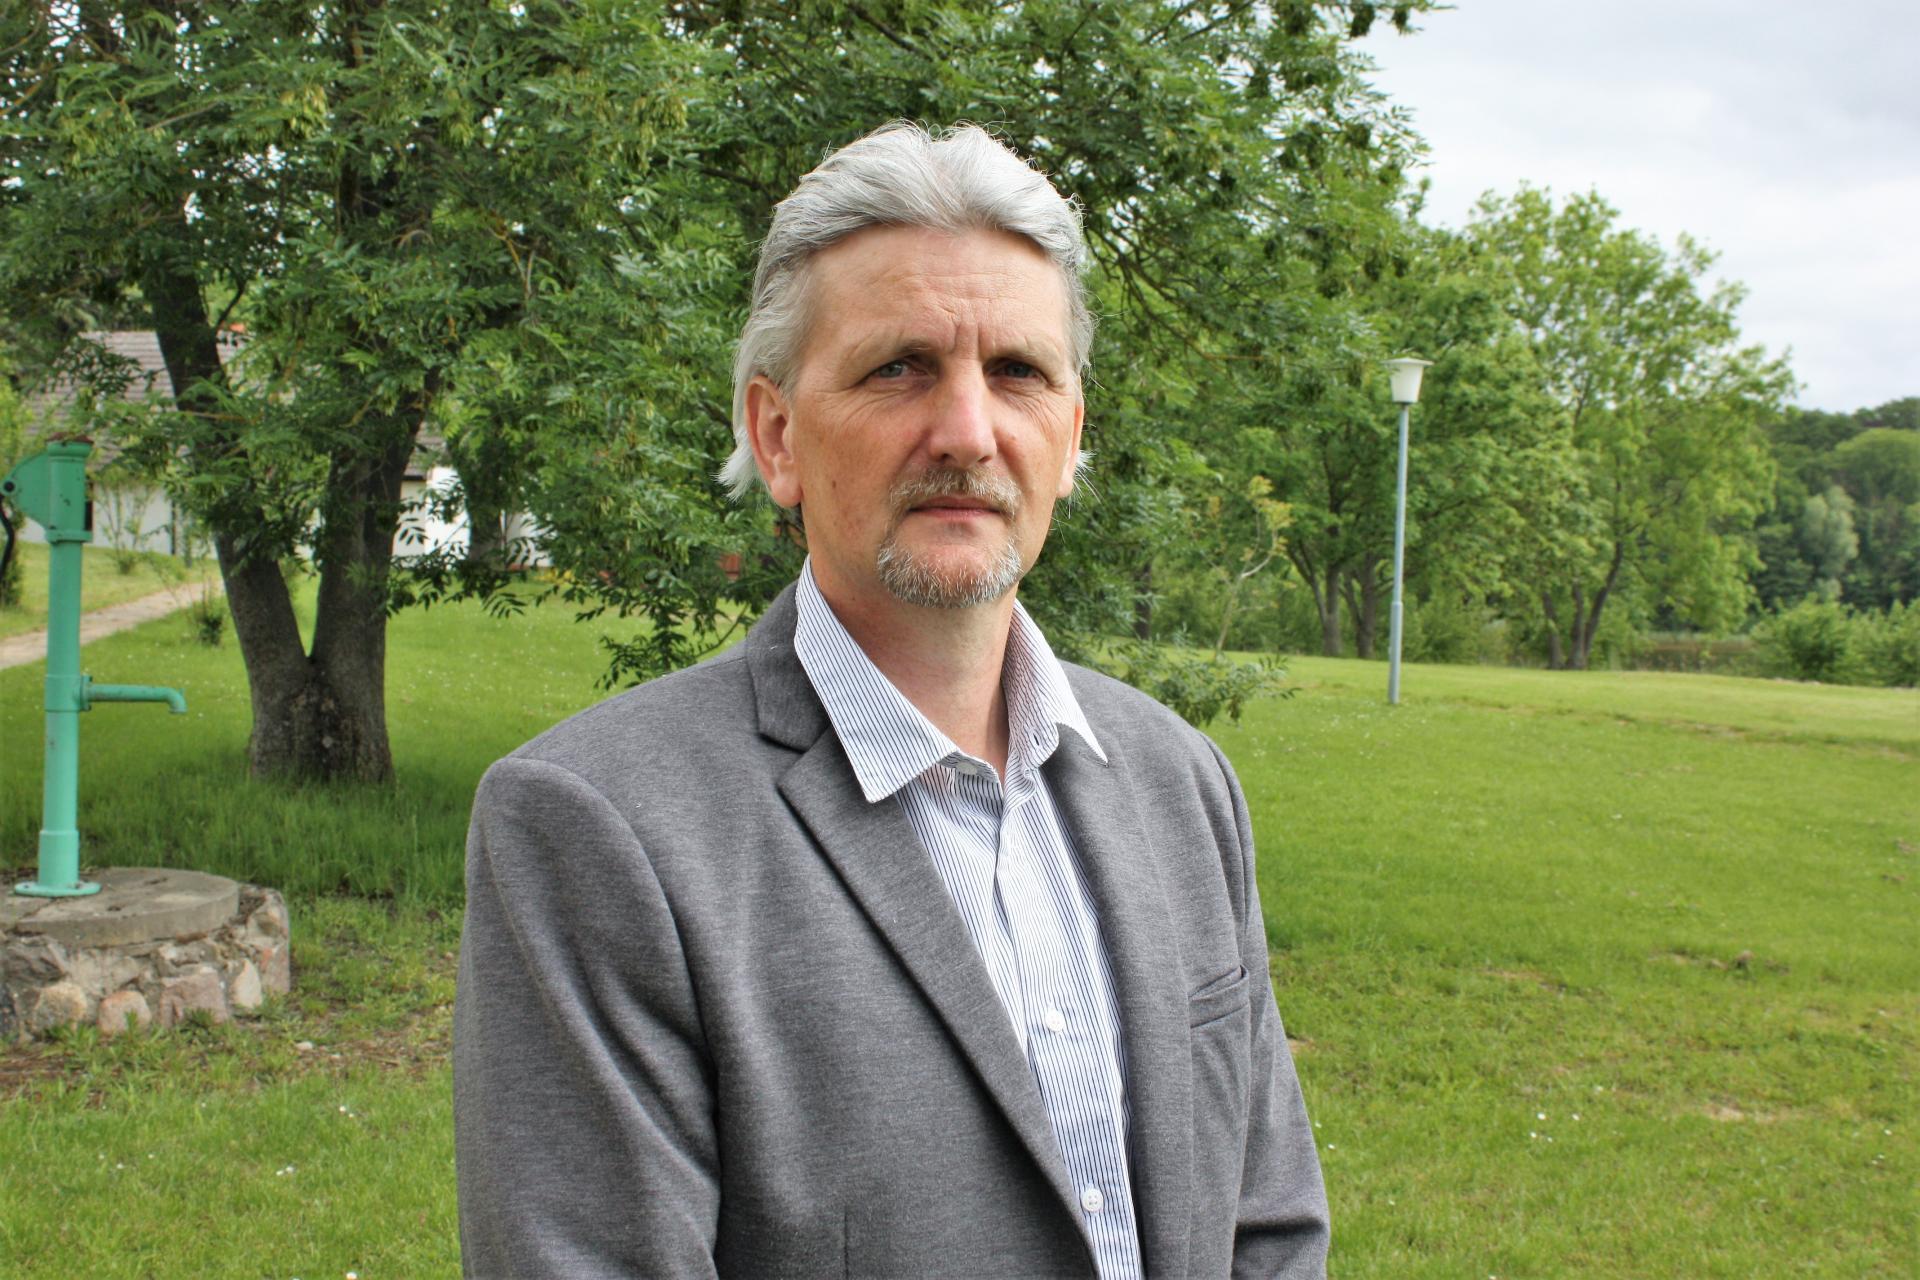 Bürgermeister Gerd Sauder